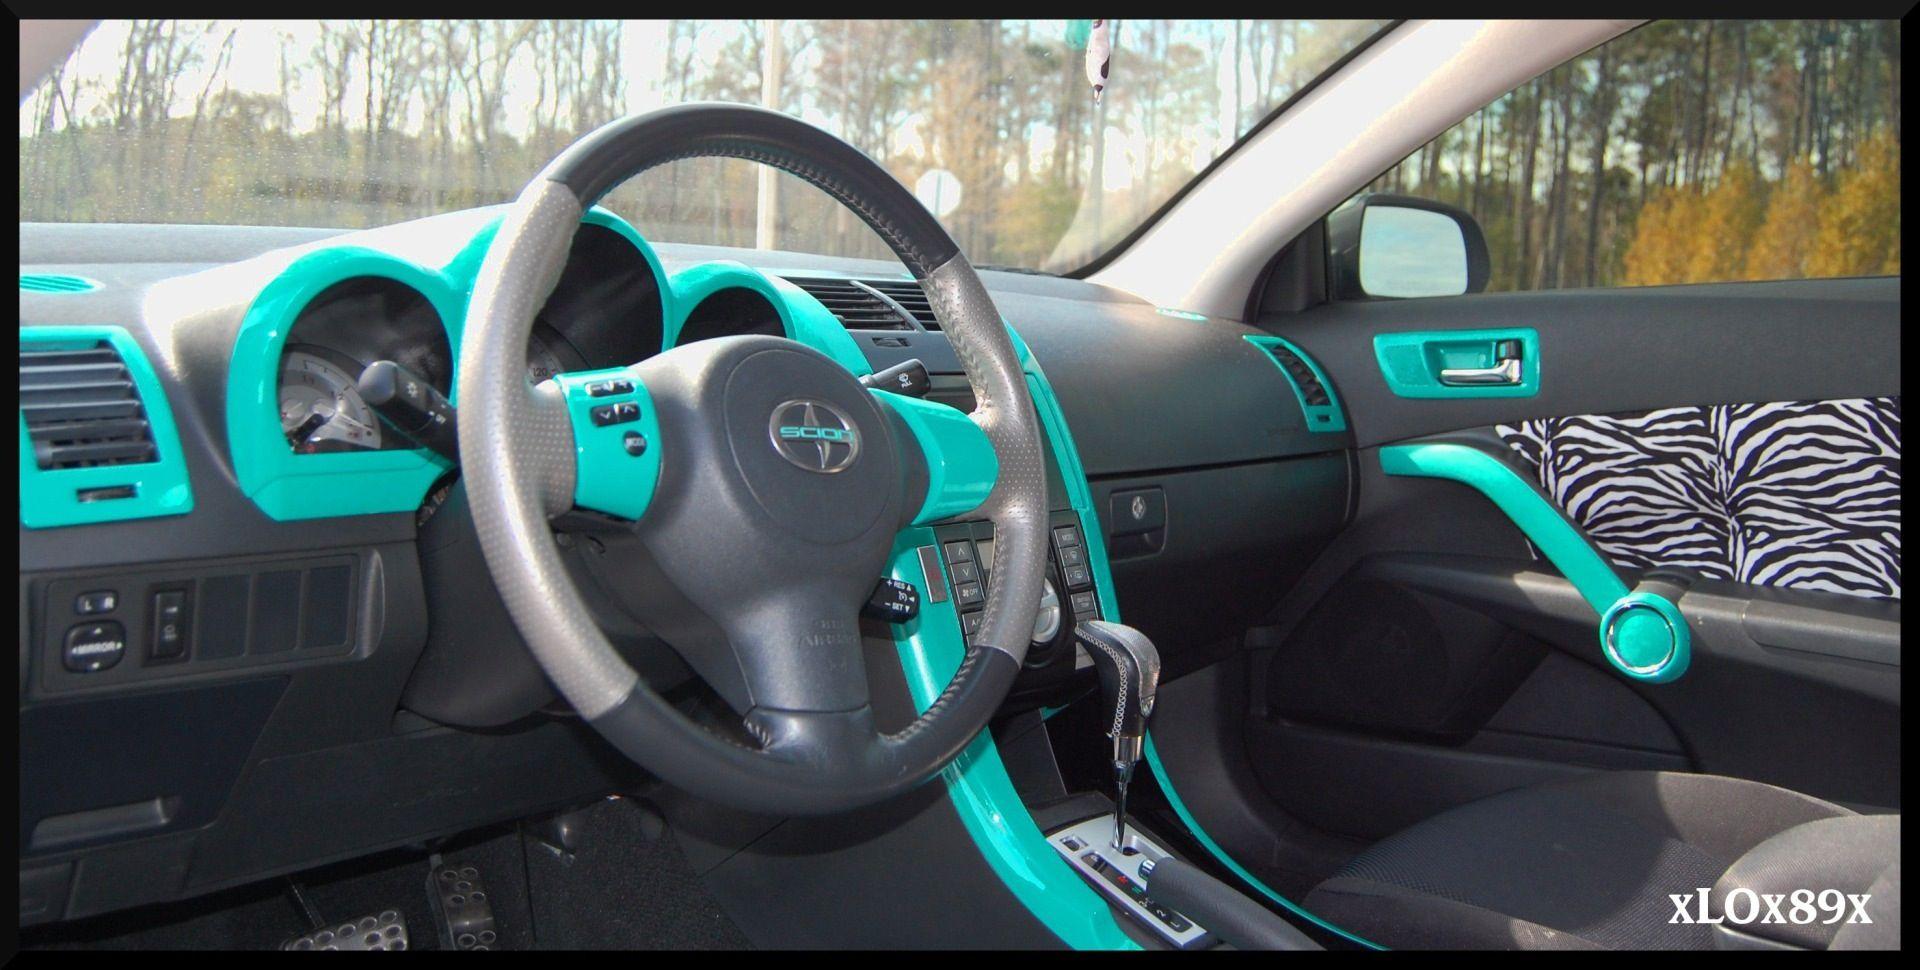 Turquoise Interior But Camo Instead Of Zebra Truck